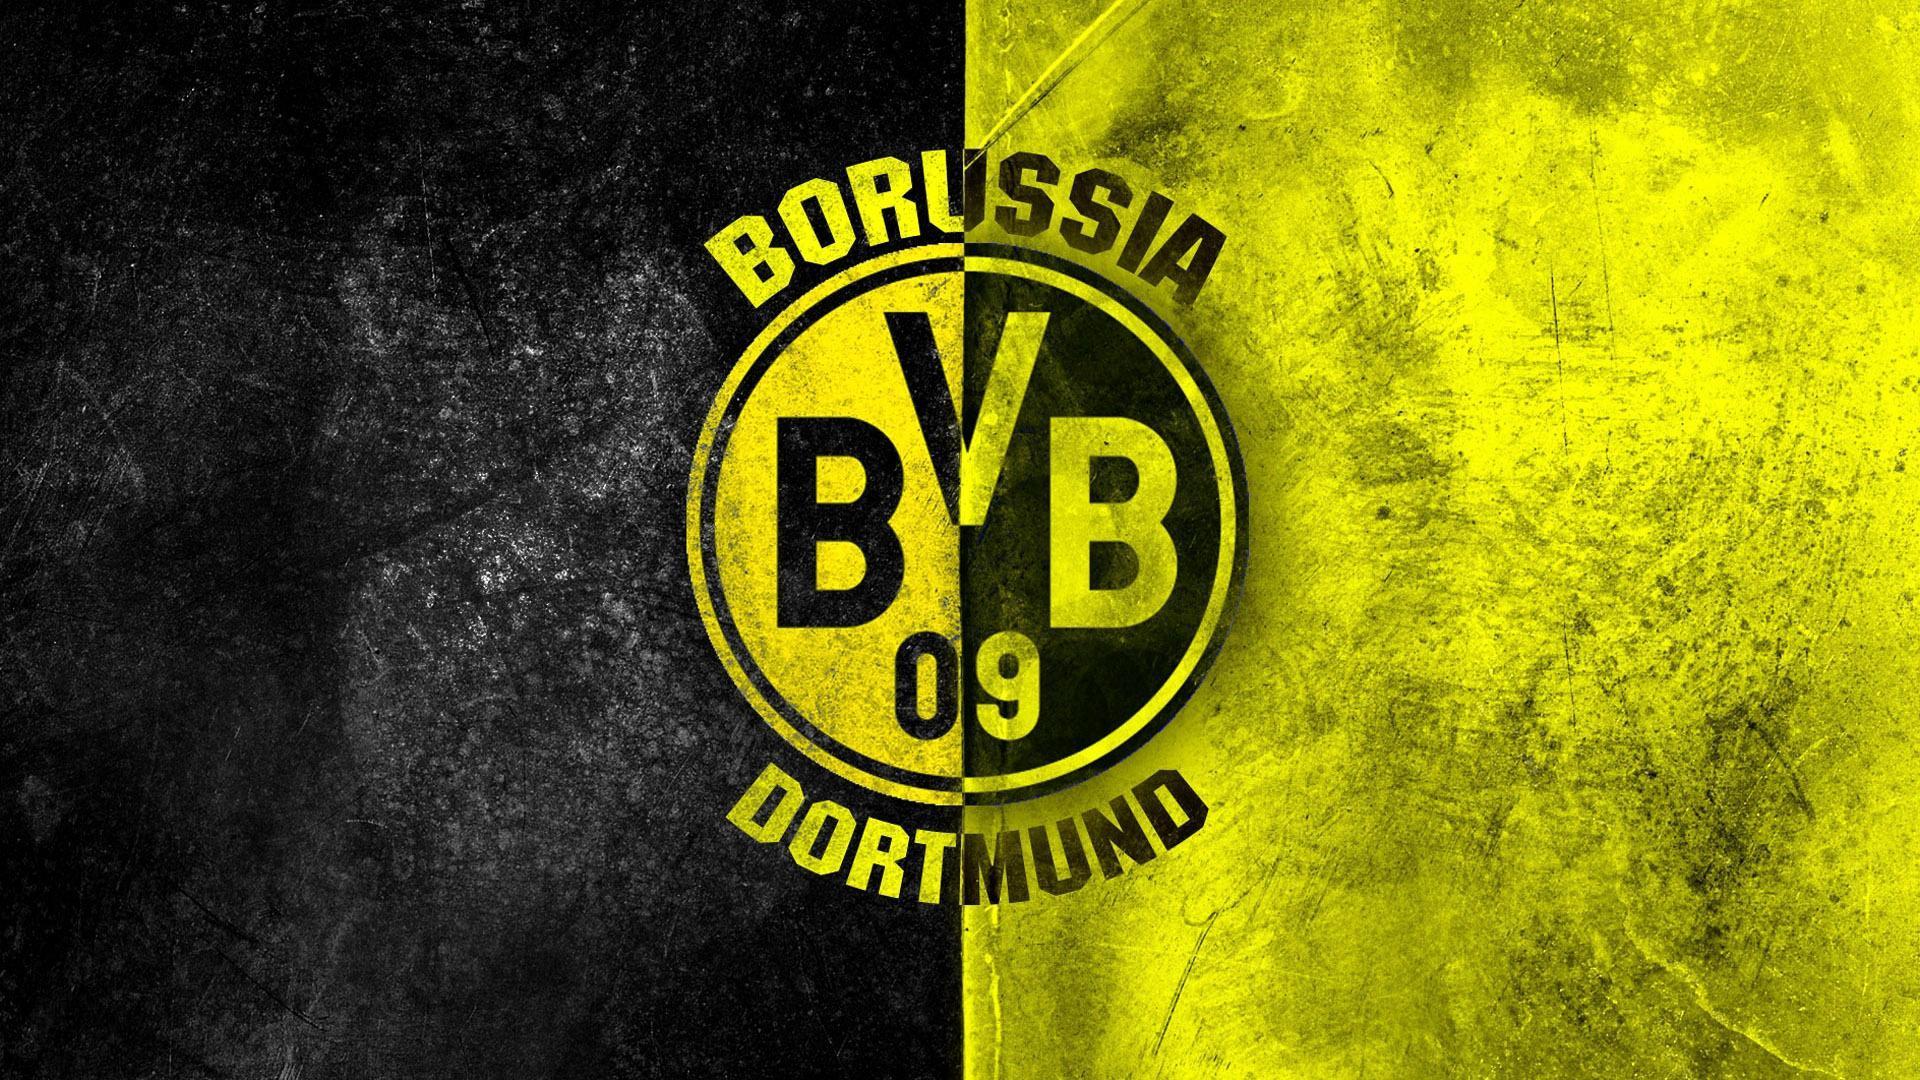 Dortmund Football Borussia dortmund logo Sports Borussia Soccer HD